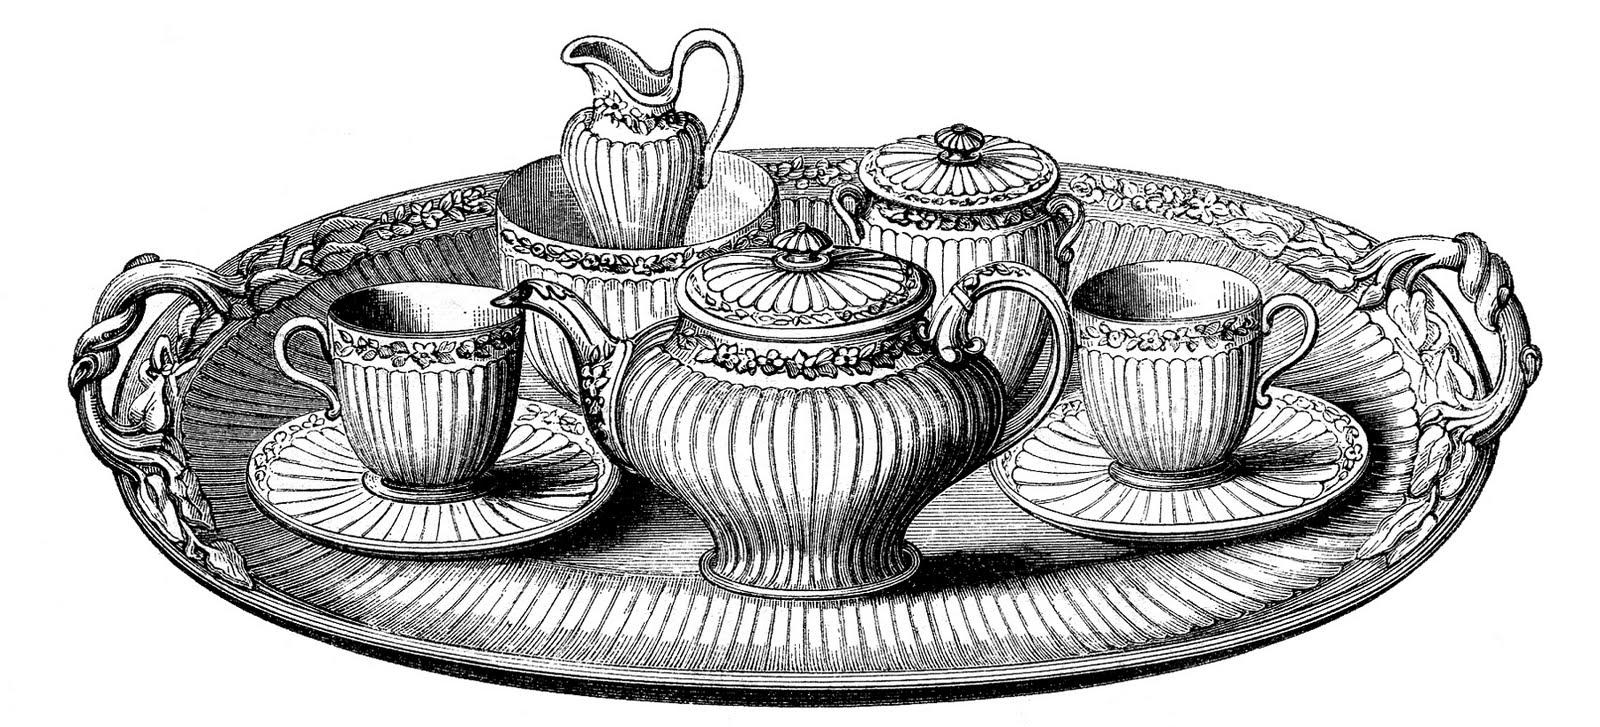 Vintage clipart tea clip art royalty free library Vintage Clip Art - Tea Set with Platter - The Graphics Fairy clip art royalty free library